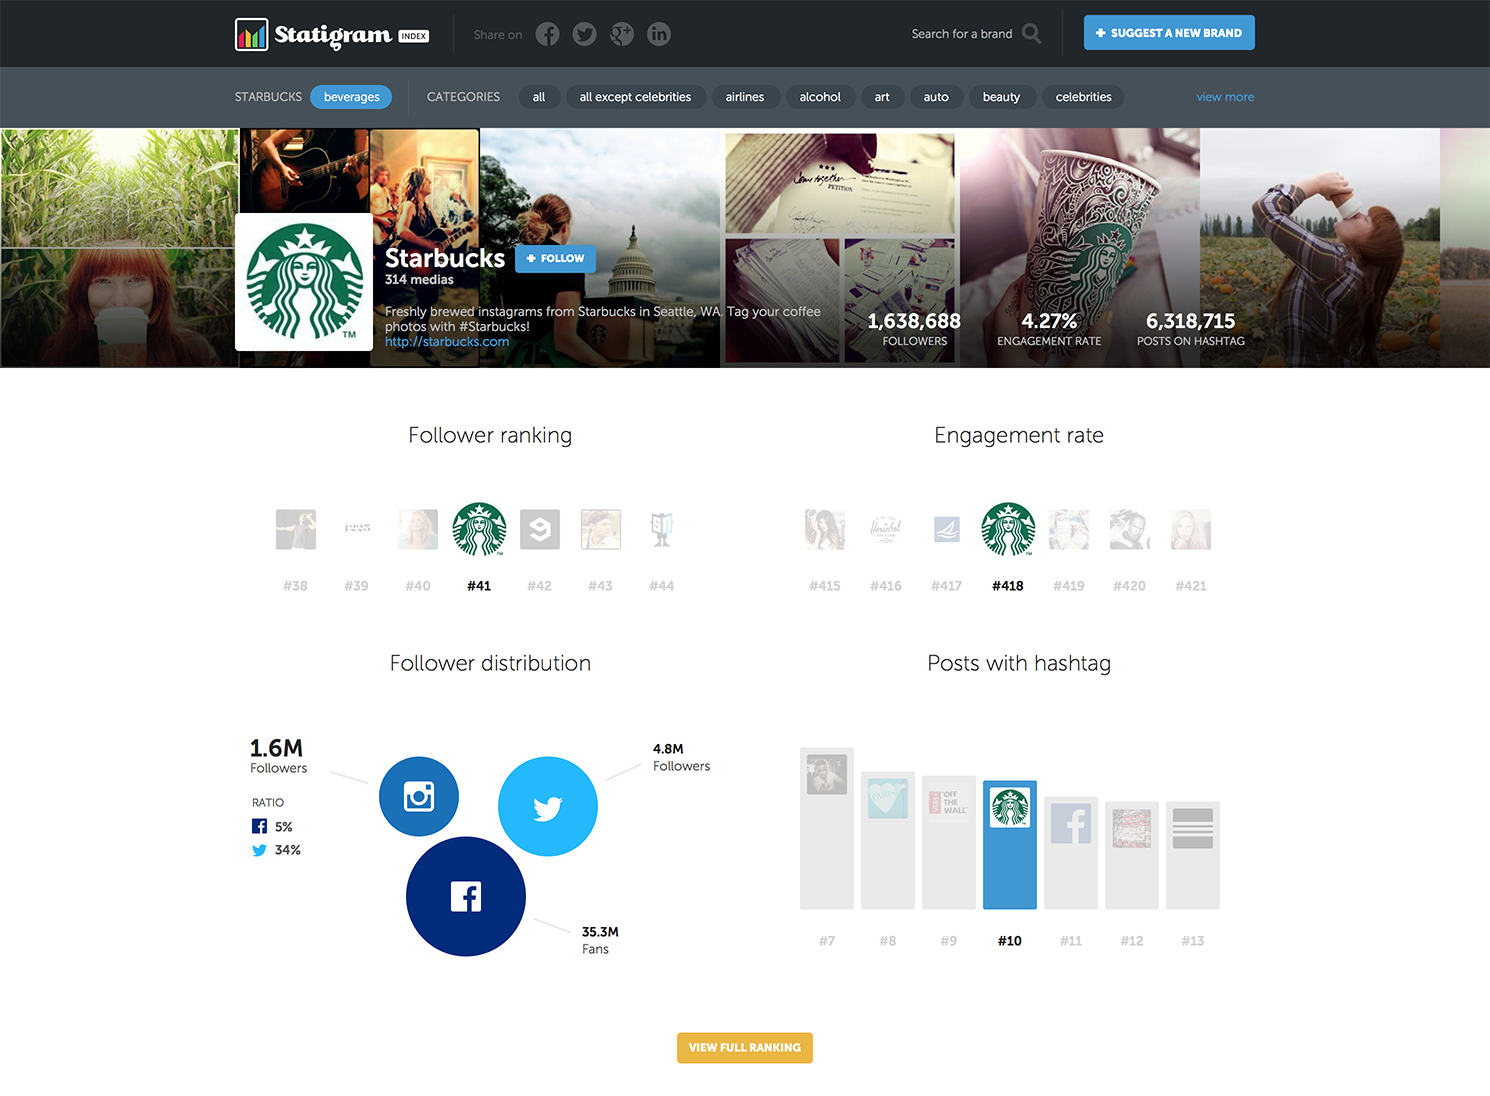 Statigram Index - Starbucks